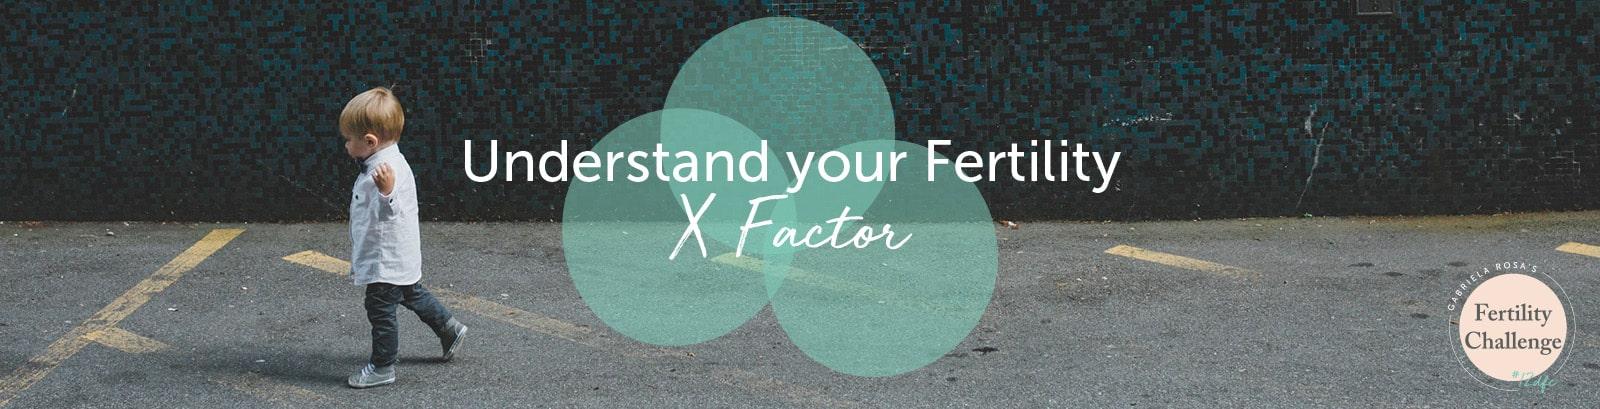 Gabriela Rosa Fertility Challenge_Fertility X Factor_Day8